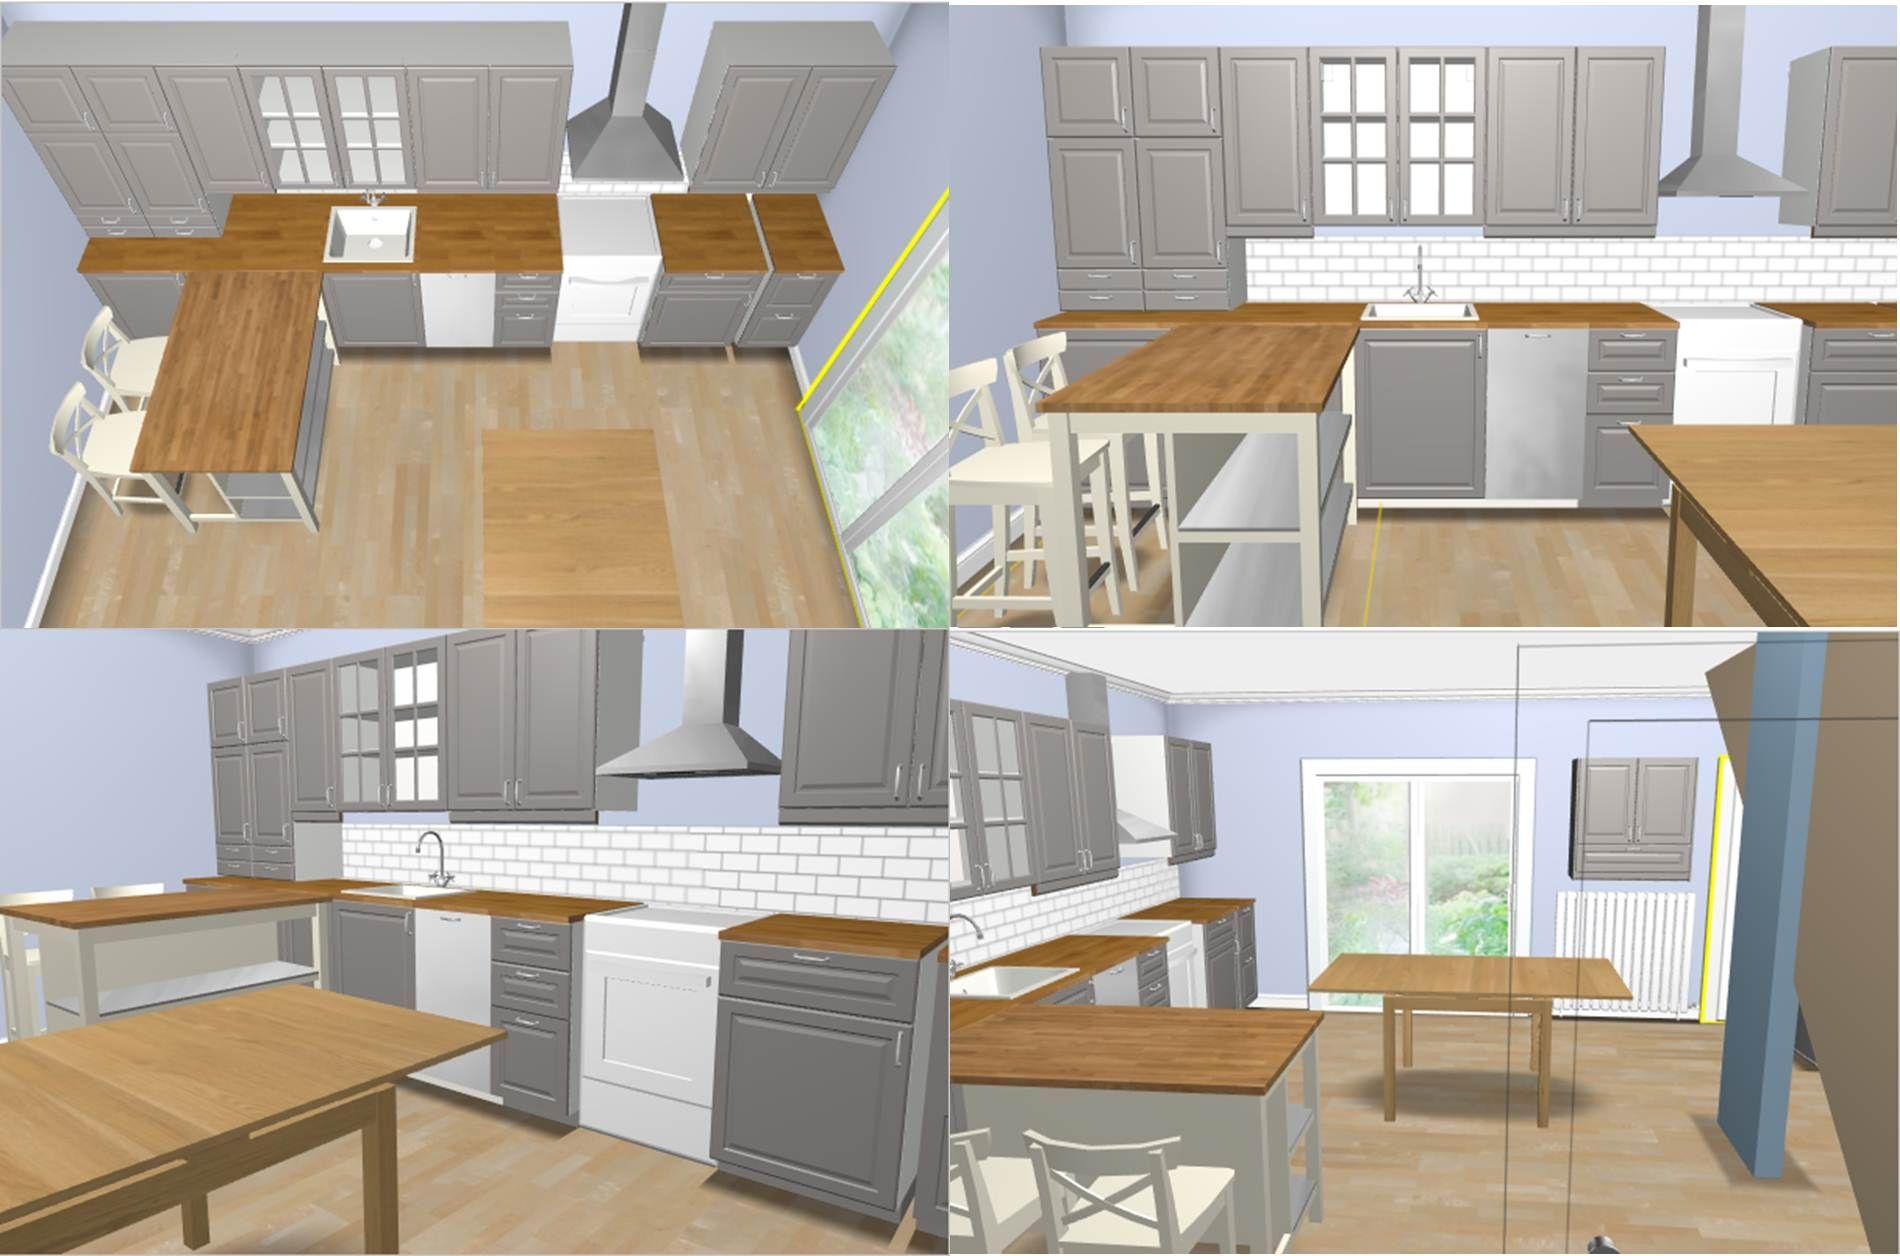 From ikea kitchen planner Ikea kitchen planner, Kitchen